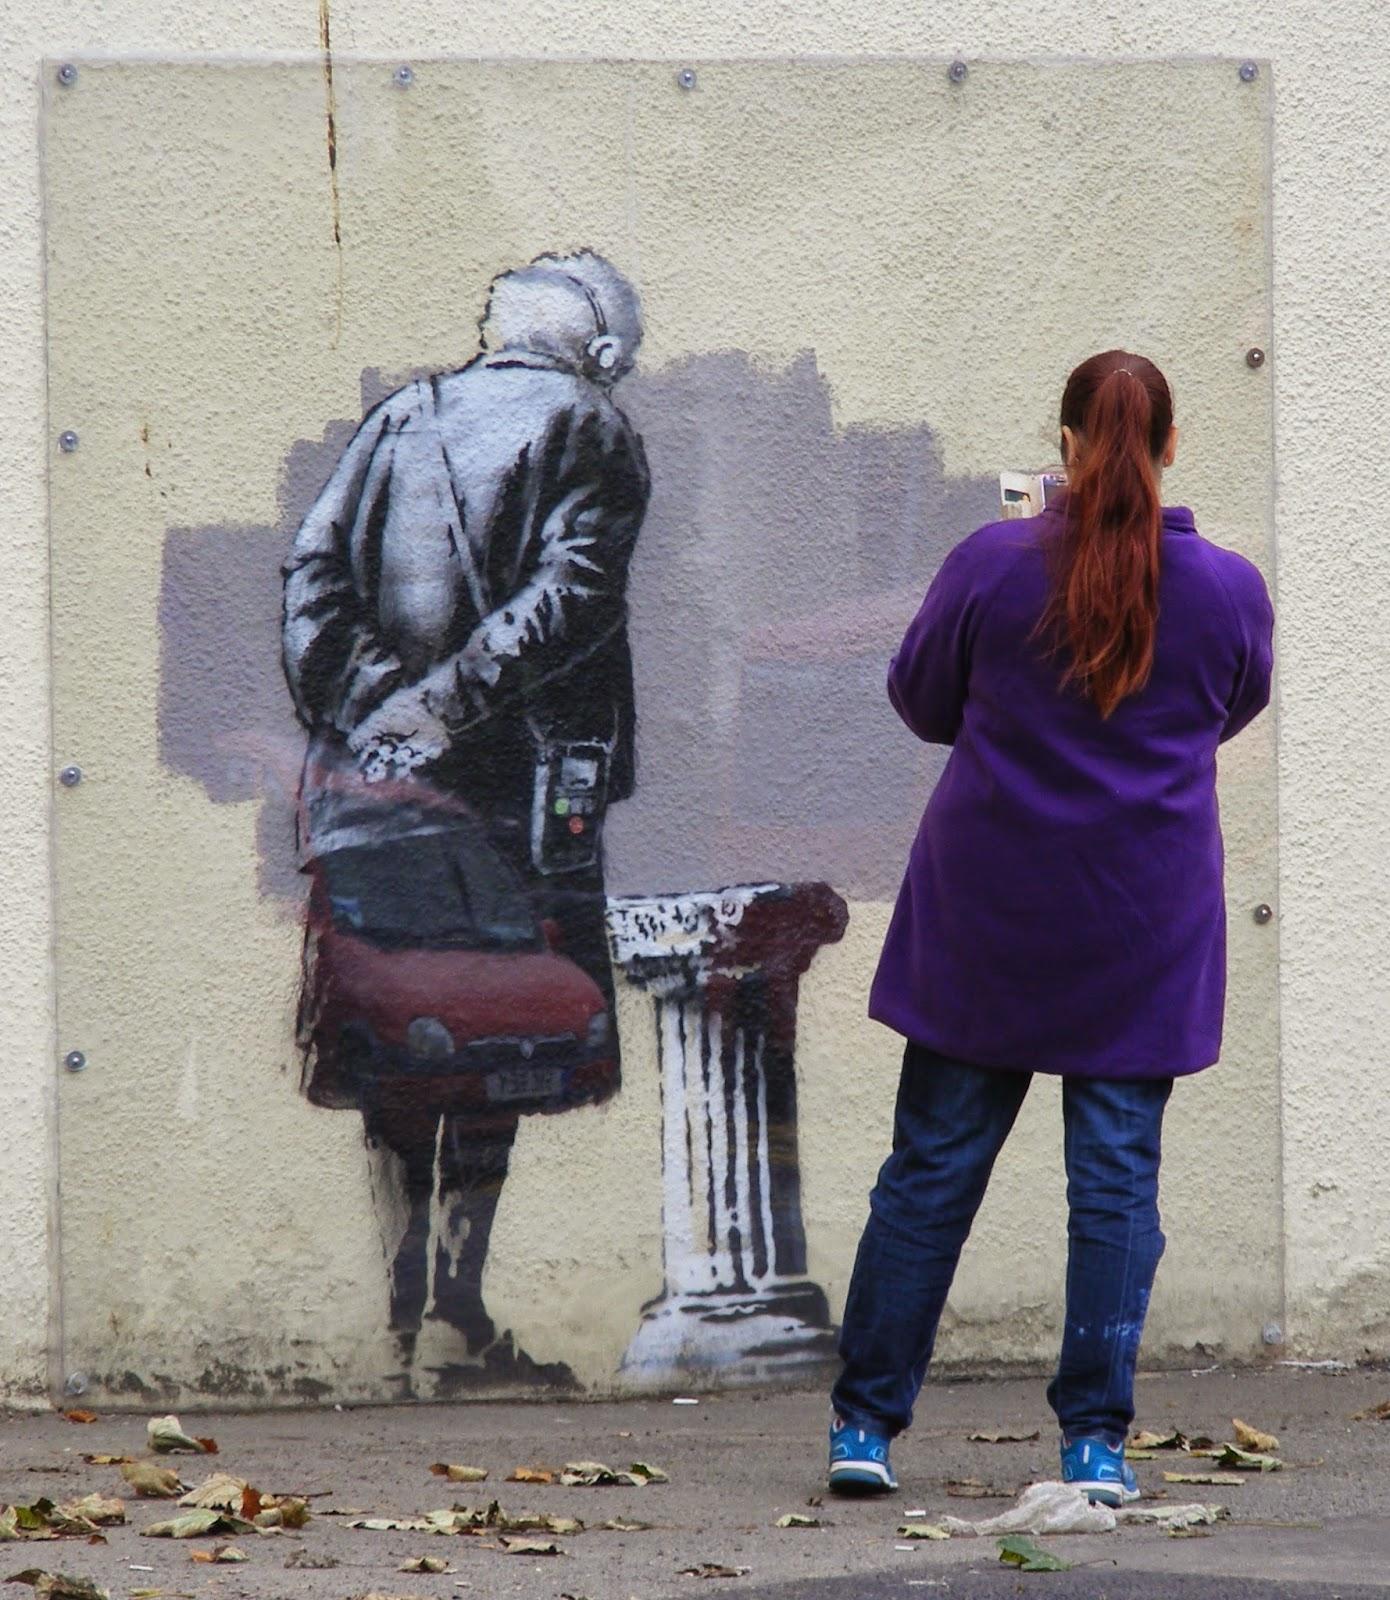 Martin Lloyd : Banksy -- here today, gone tomorrow.